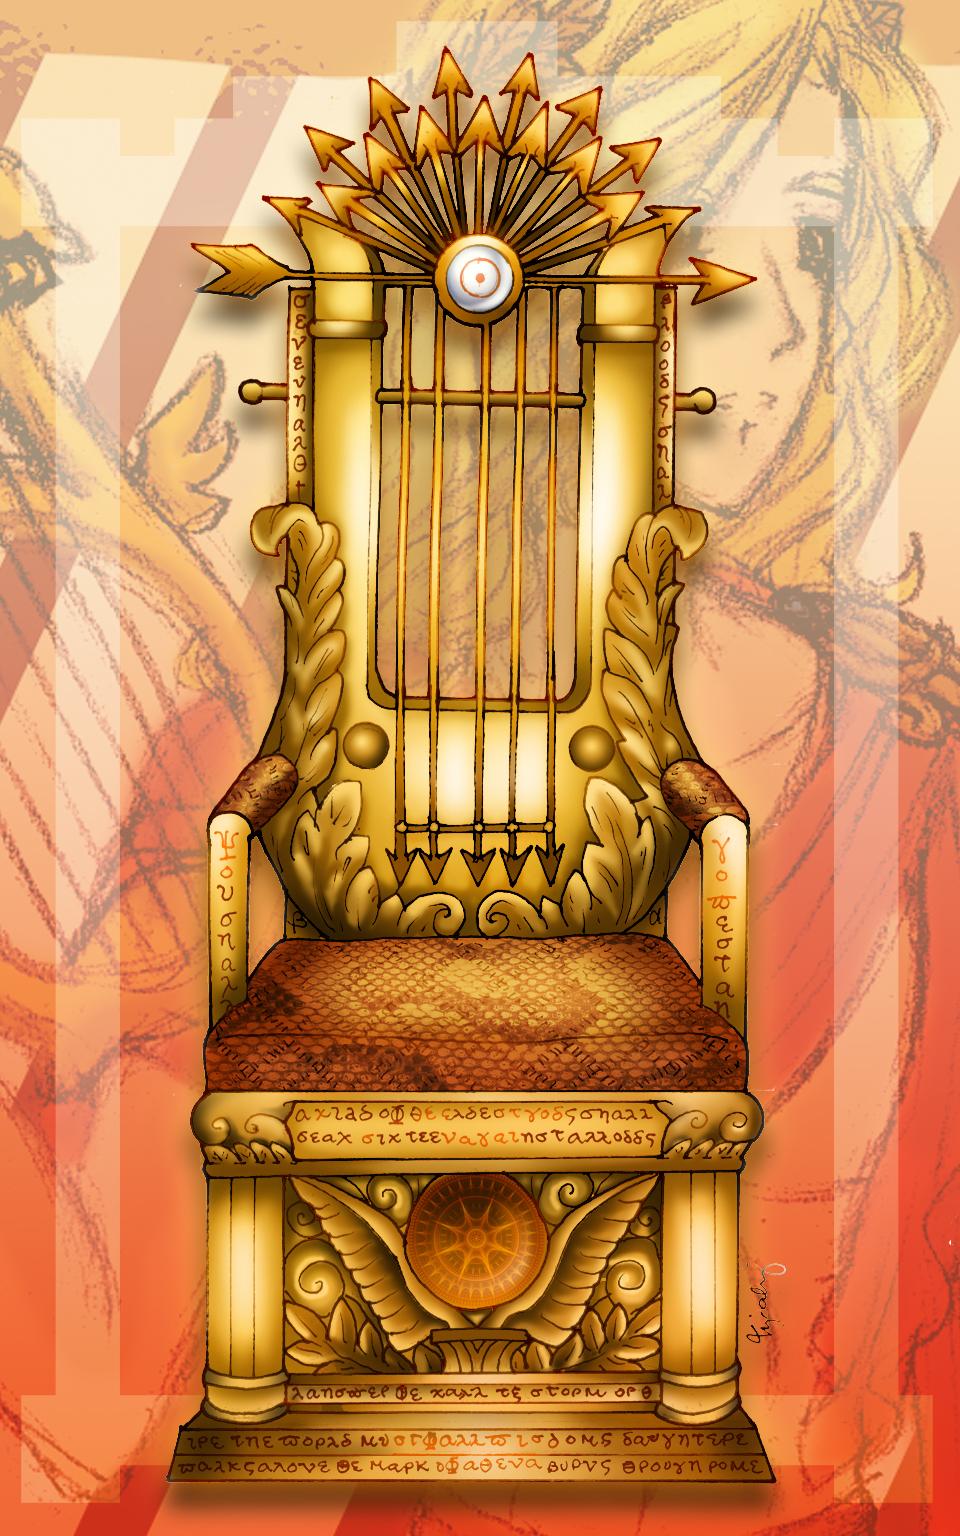 Apollo's Throne of Truth by lordaphaius28 on DeviantArt